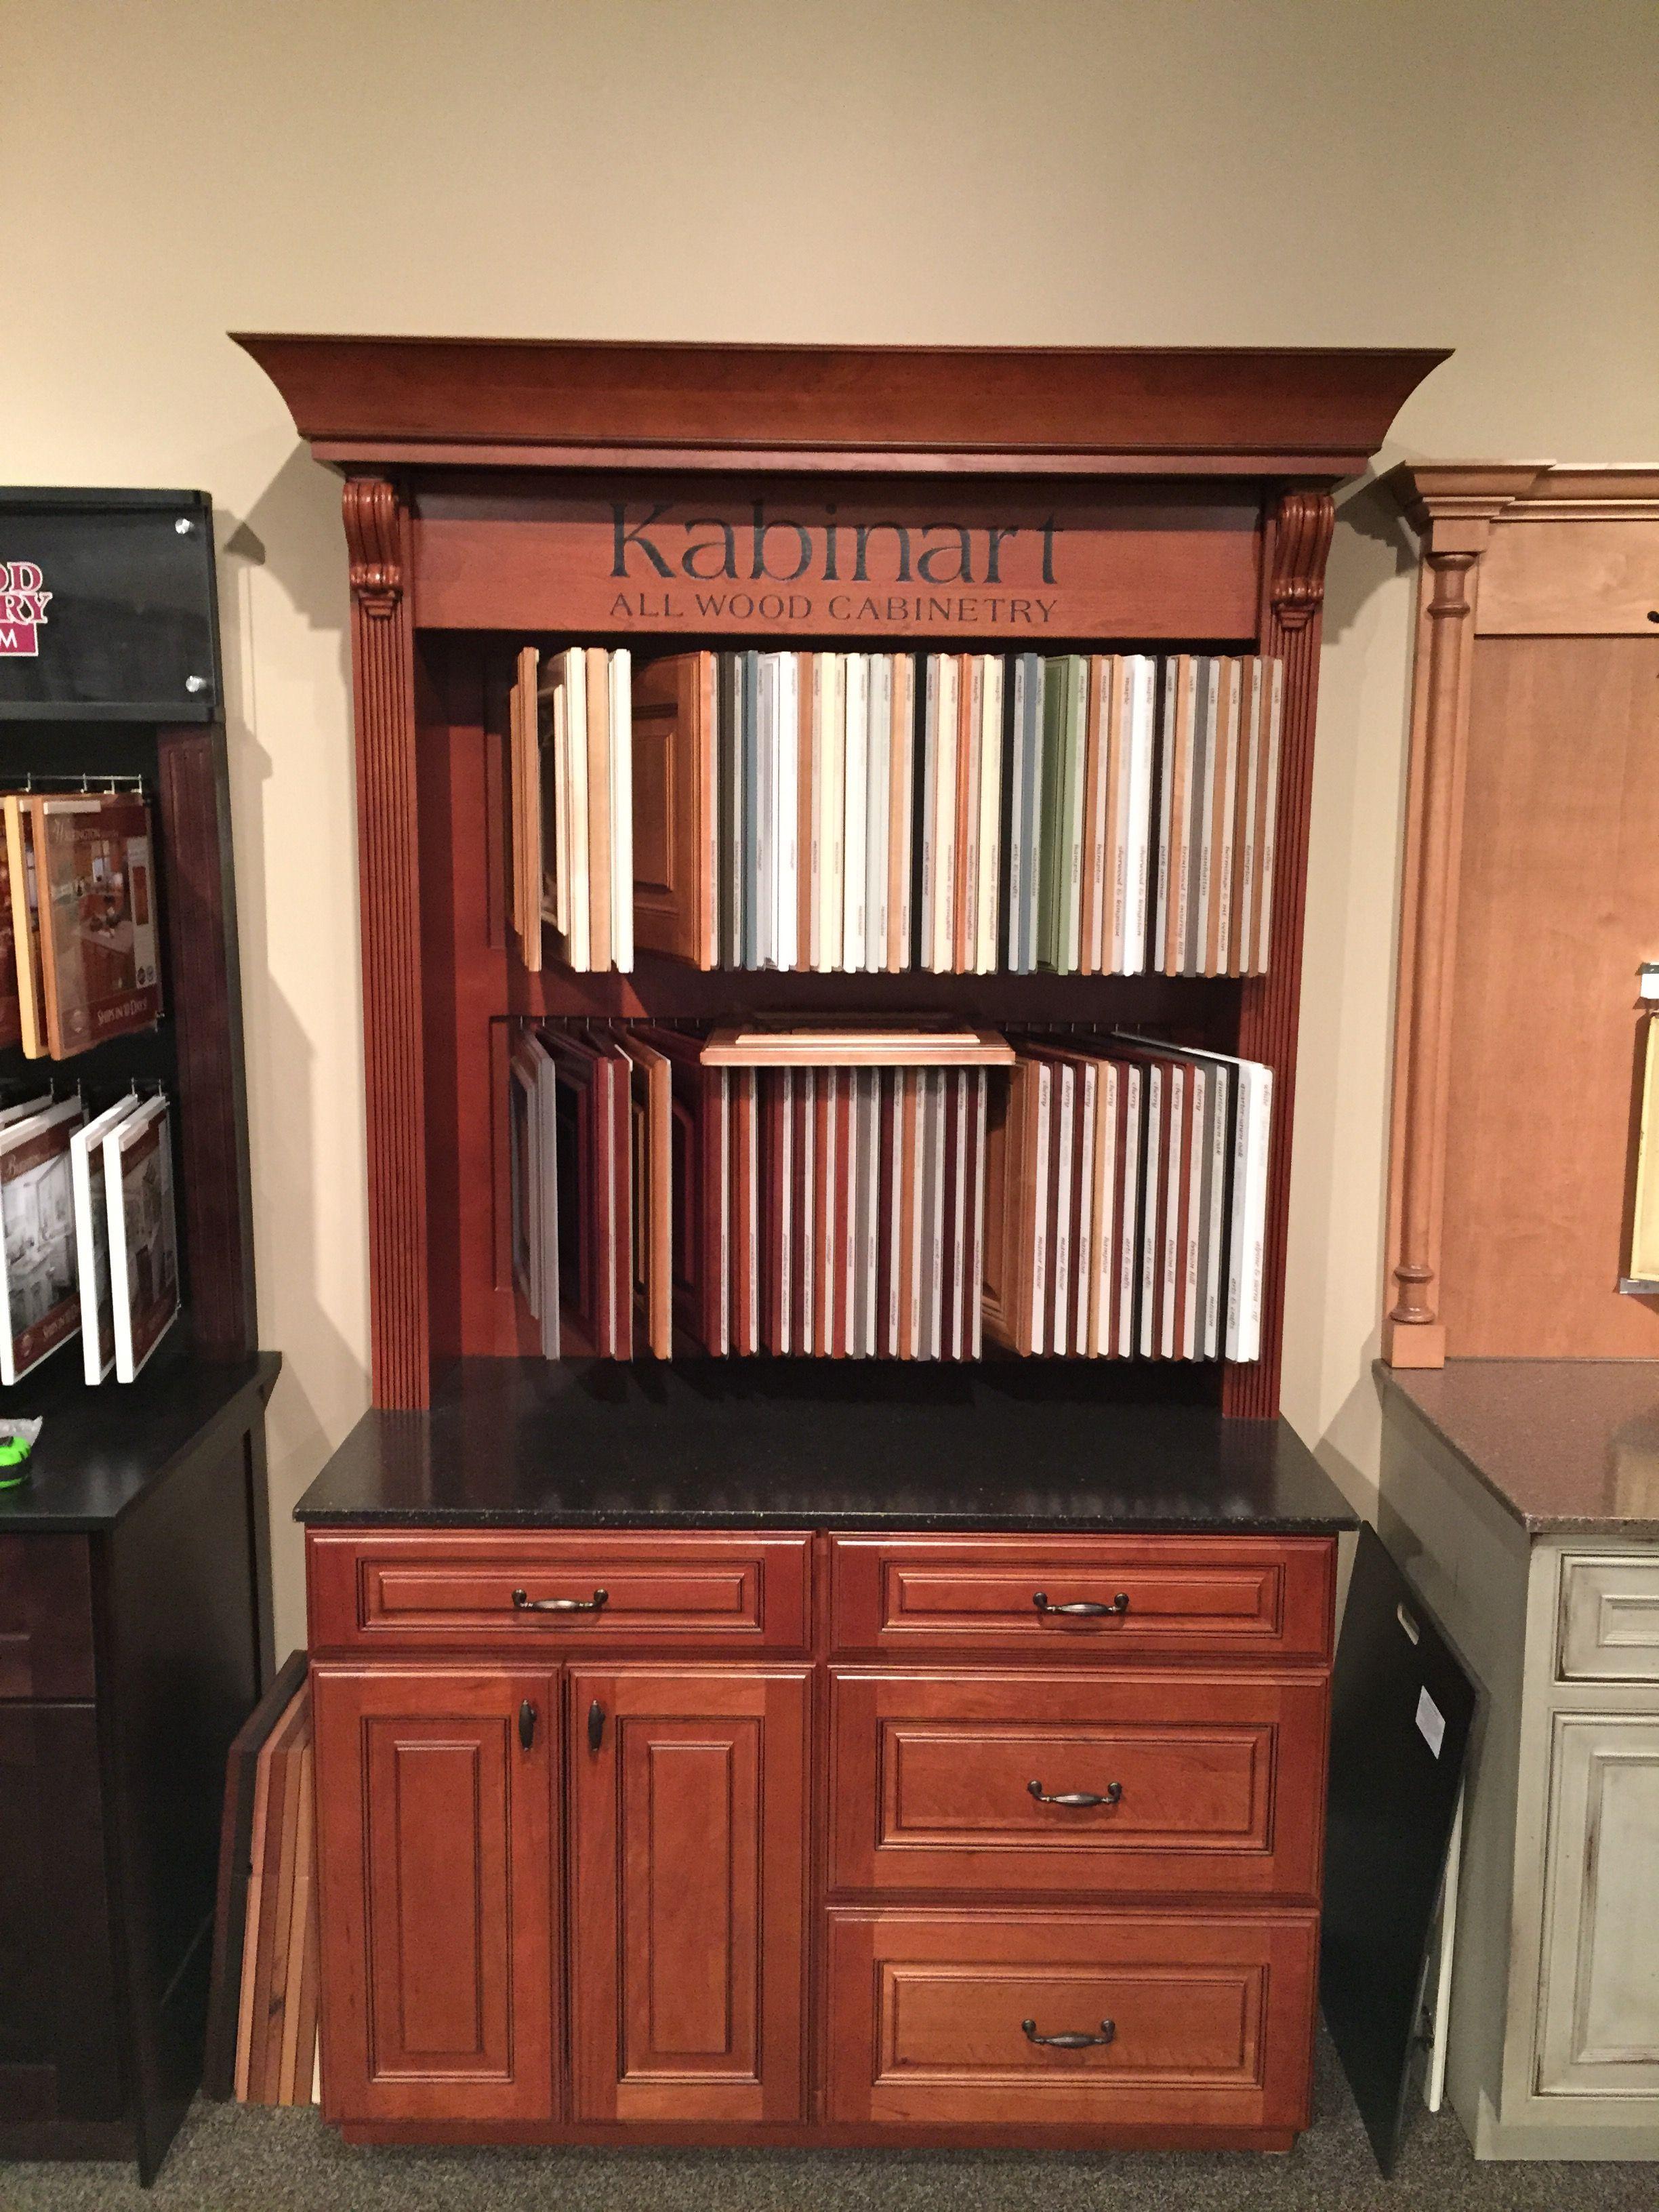 Beau Kabinart Cabinets